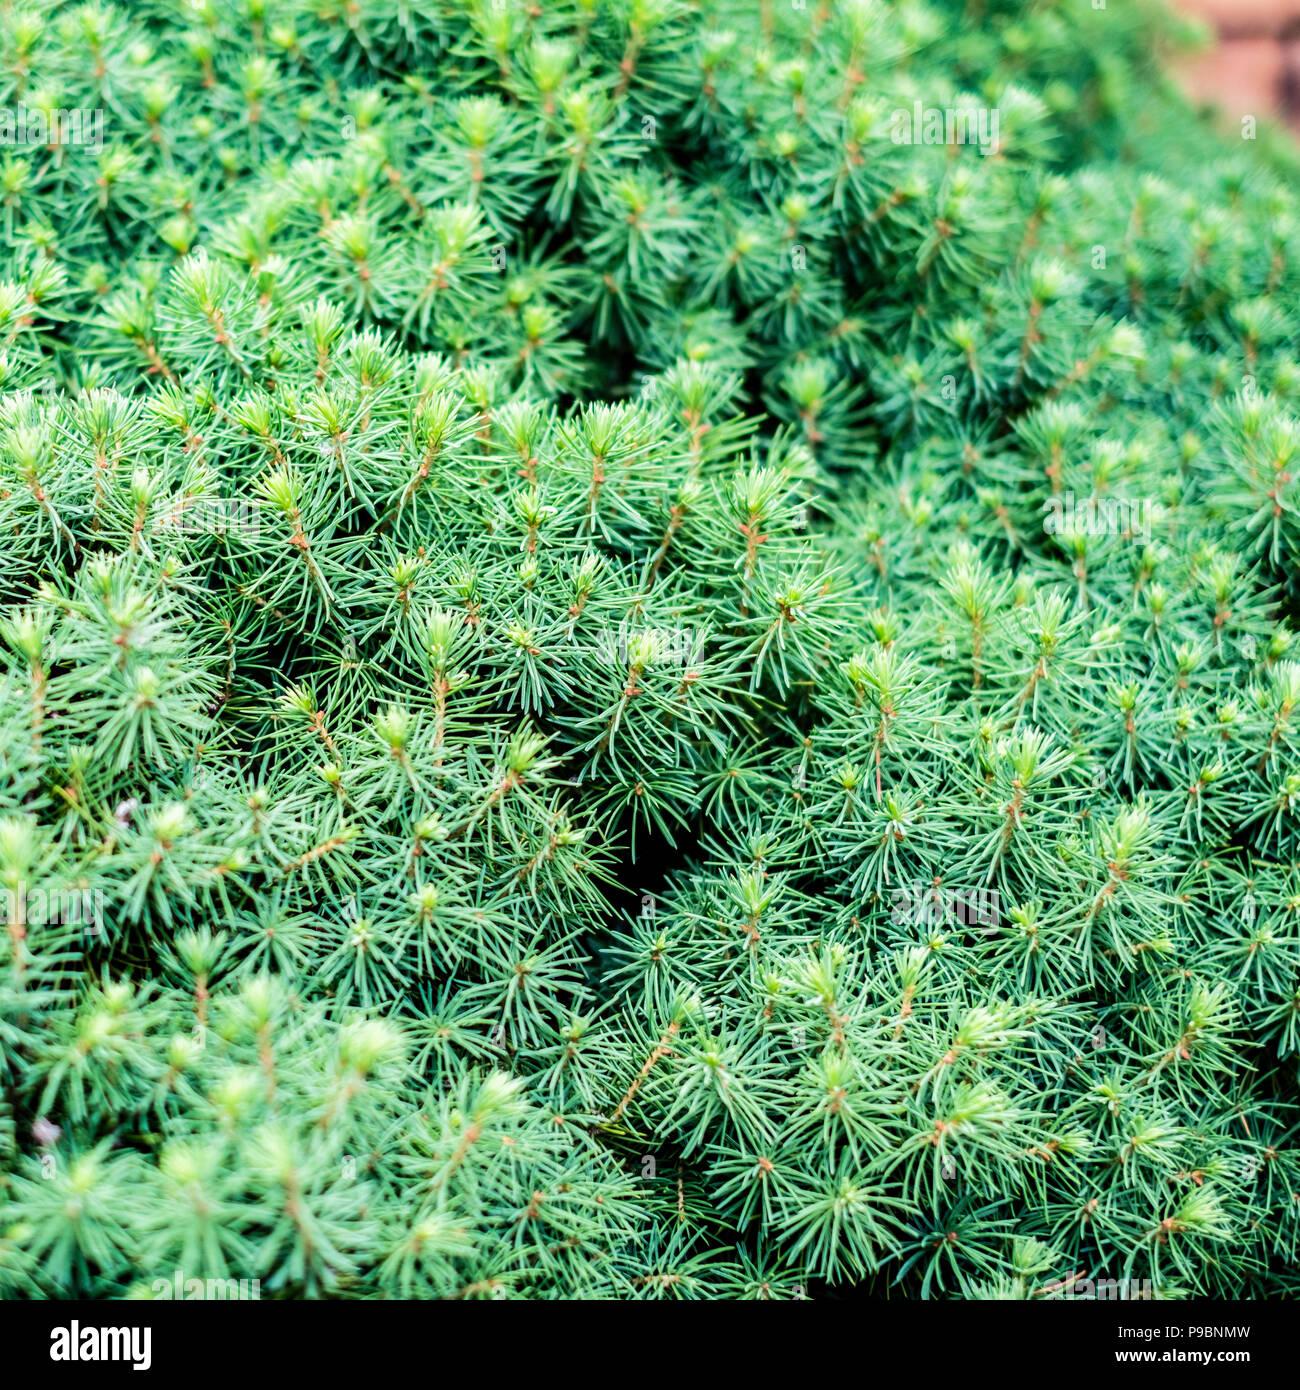 A dwarf mounding Picea, a white spruce, growing in Kansas, USA. - Stock Image